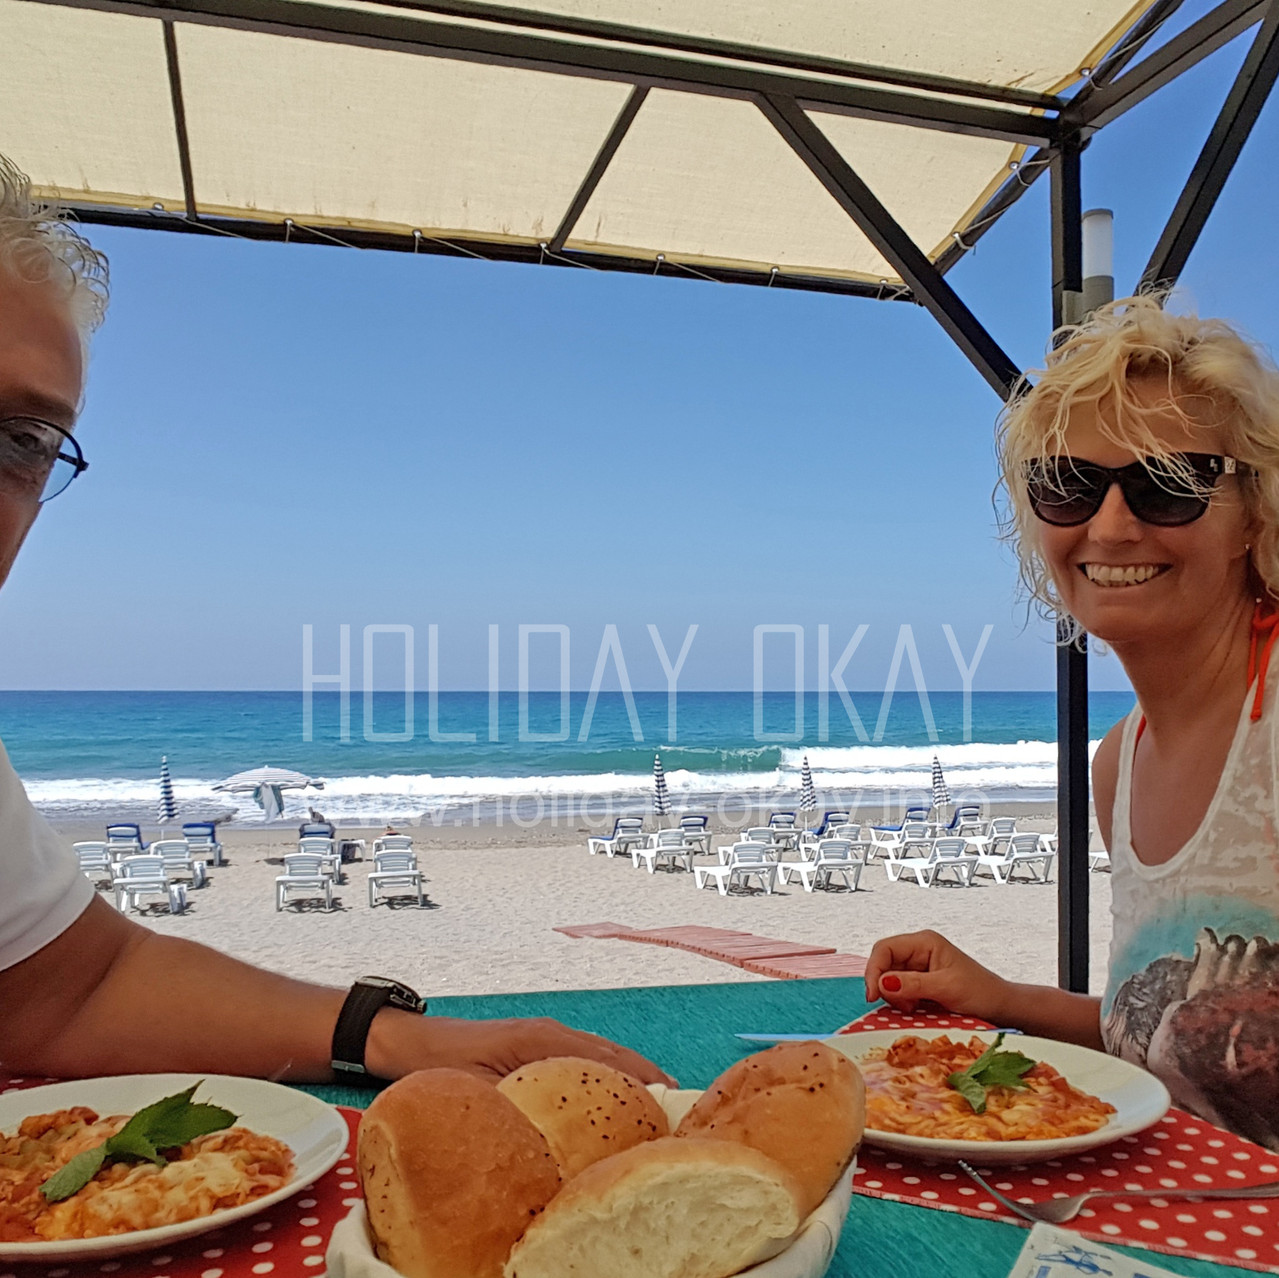 HOLIDAY OKAY TURKEY | BEACH GARDEN